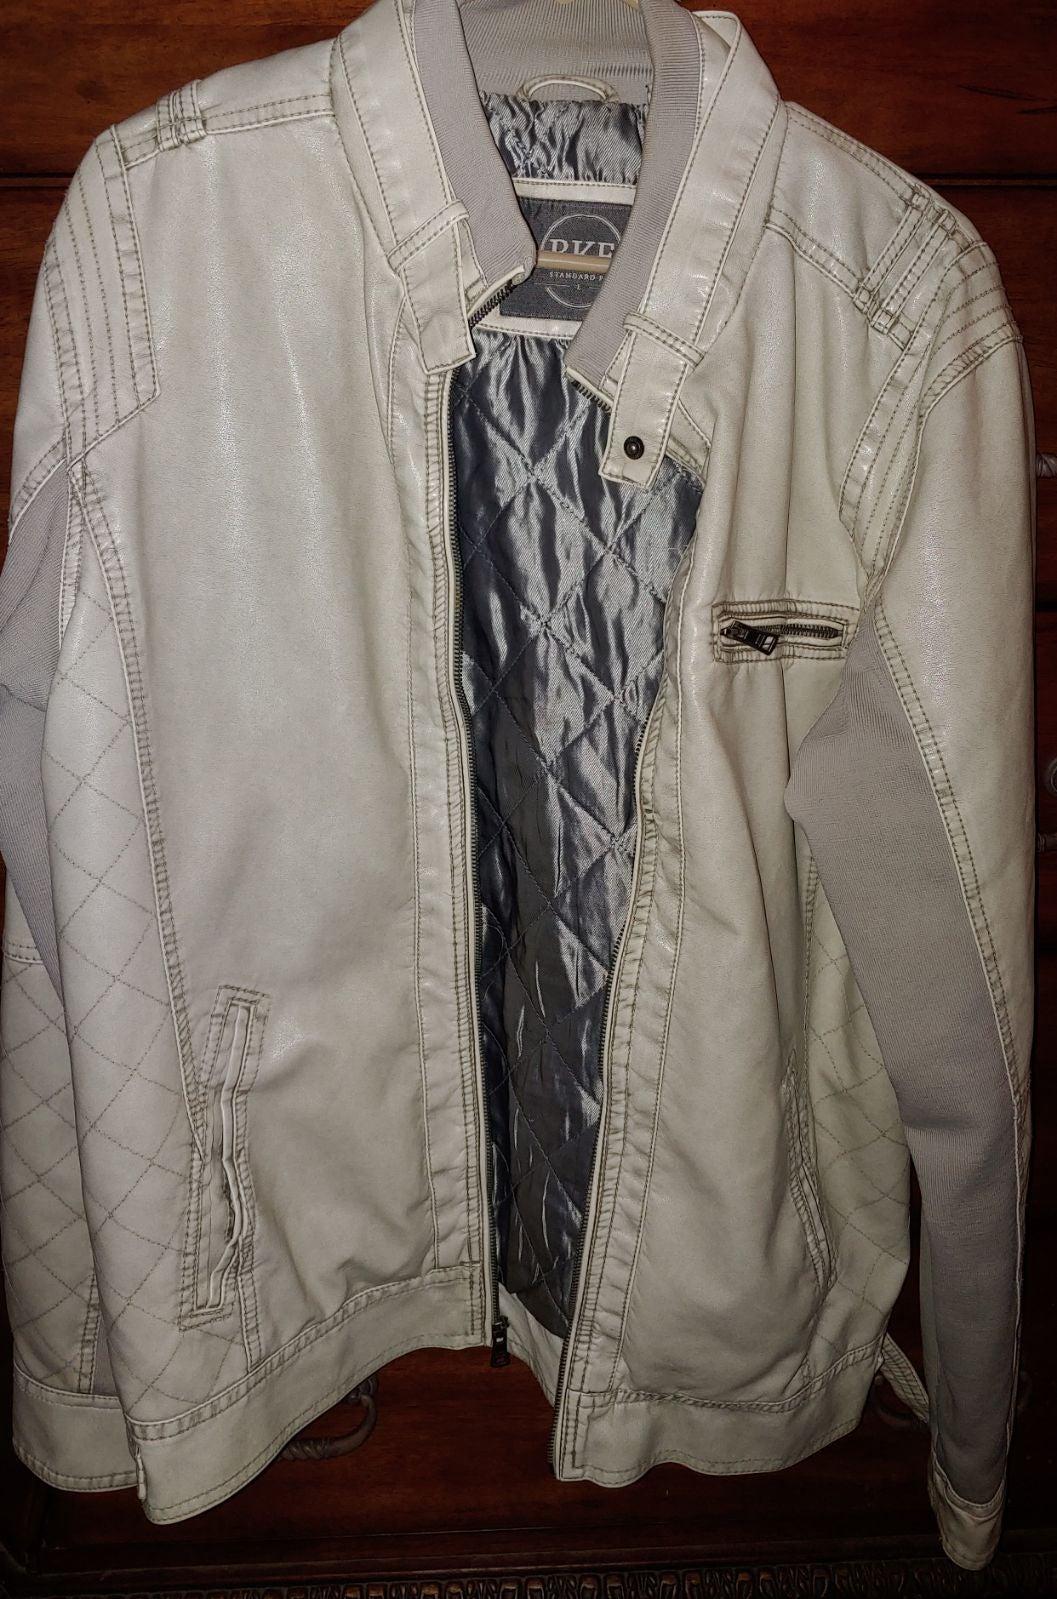 Buckle Brand BKE men's Jacket